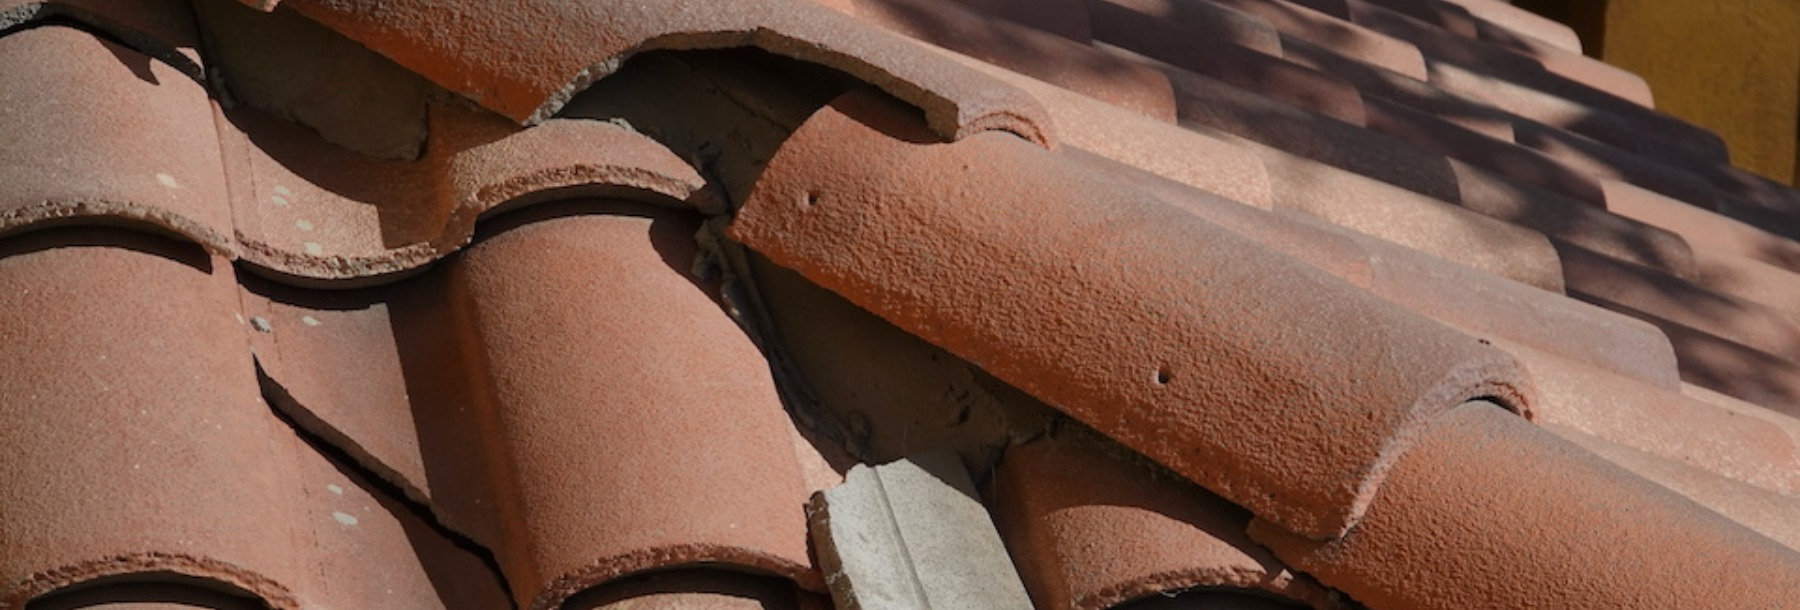 roof damage